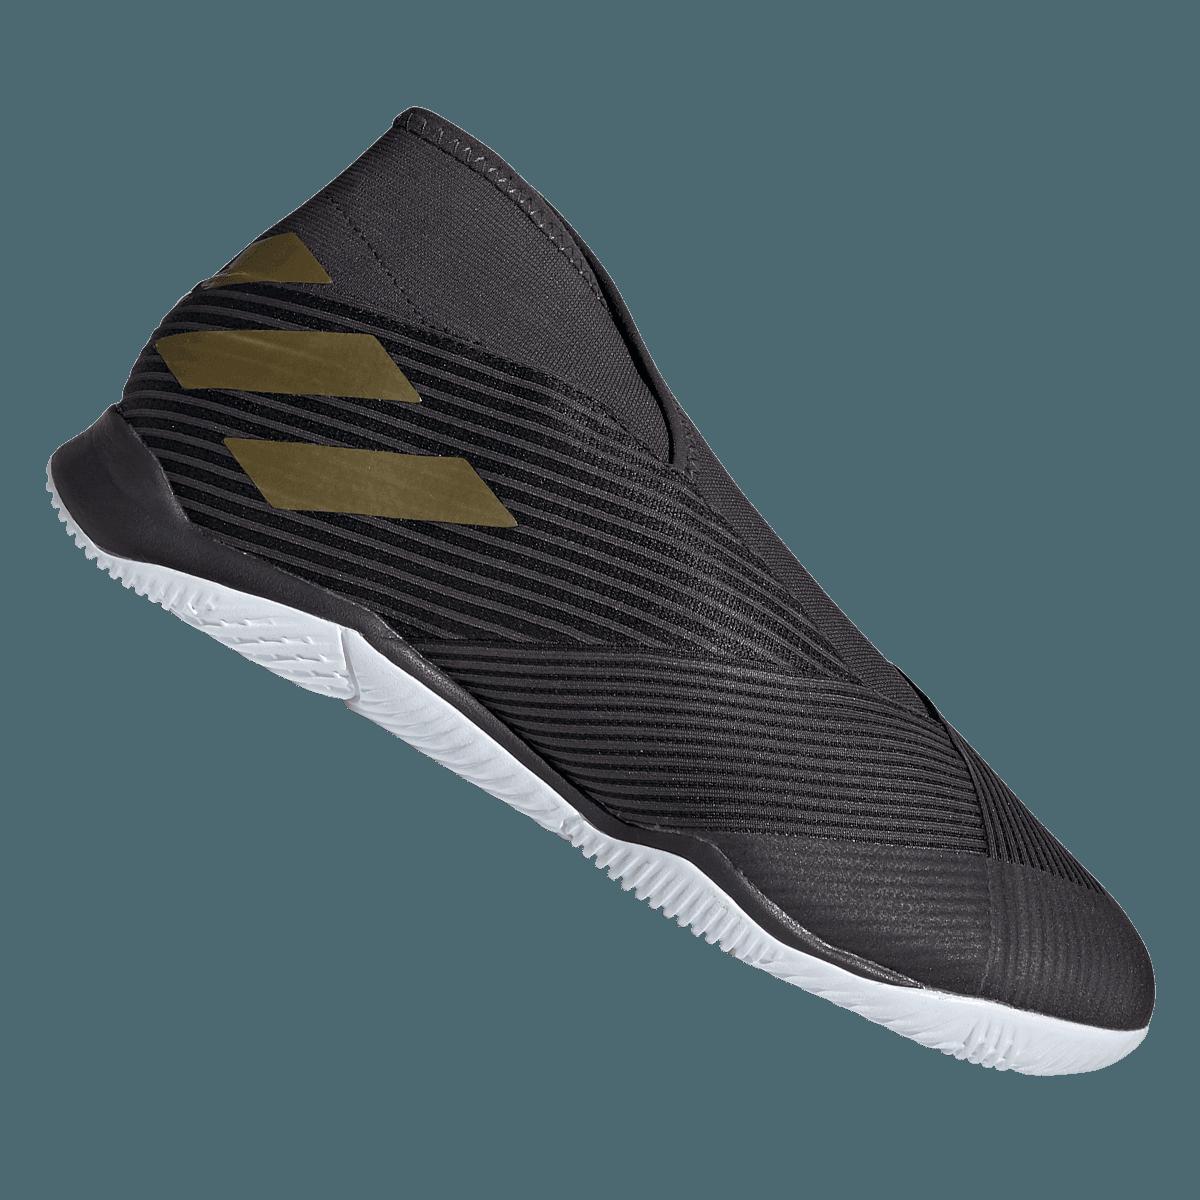 new design release date latest design adidas Hallenschuh Nemeziz 19.3 LL IN schwarz